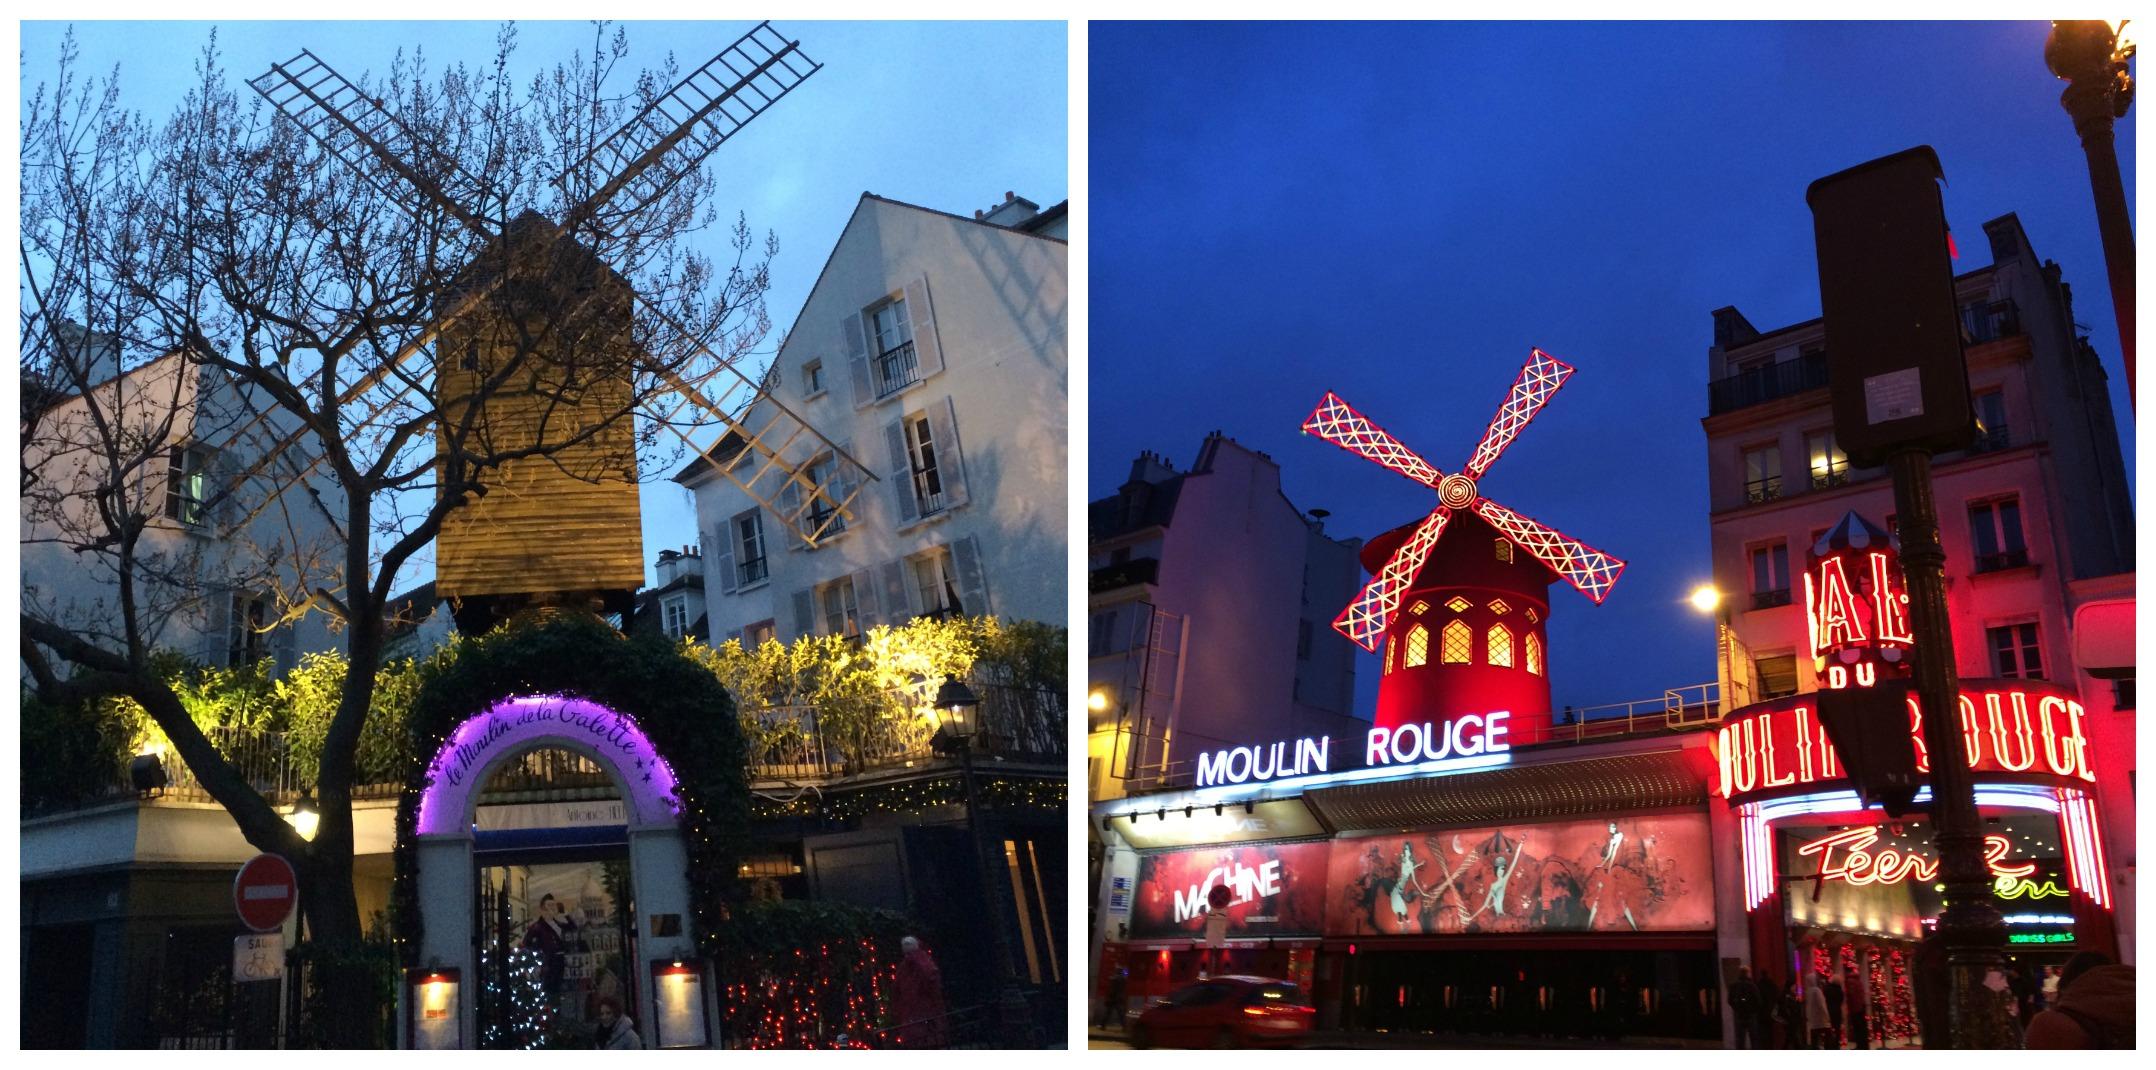 Moulin Rouge & dinner